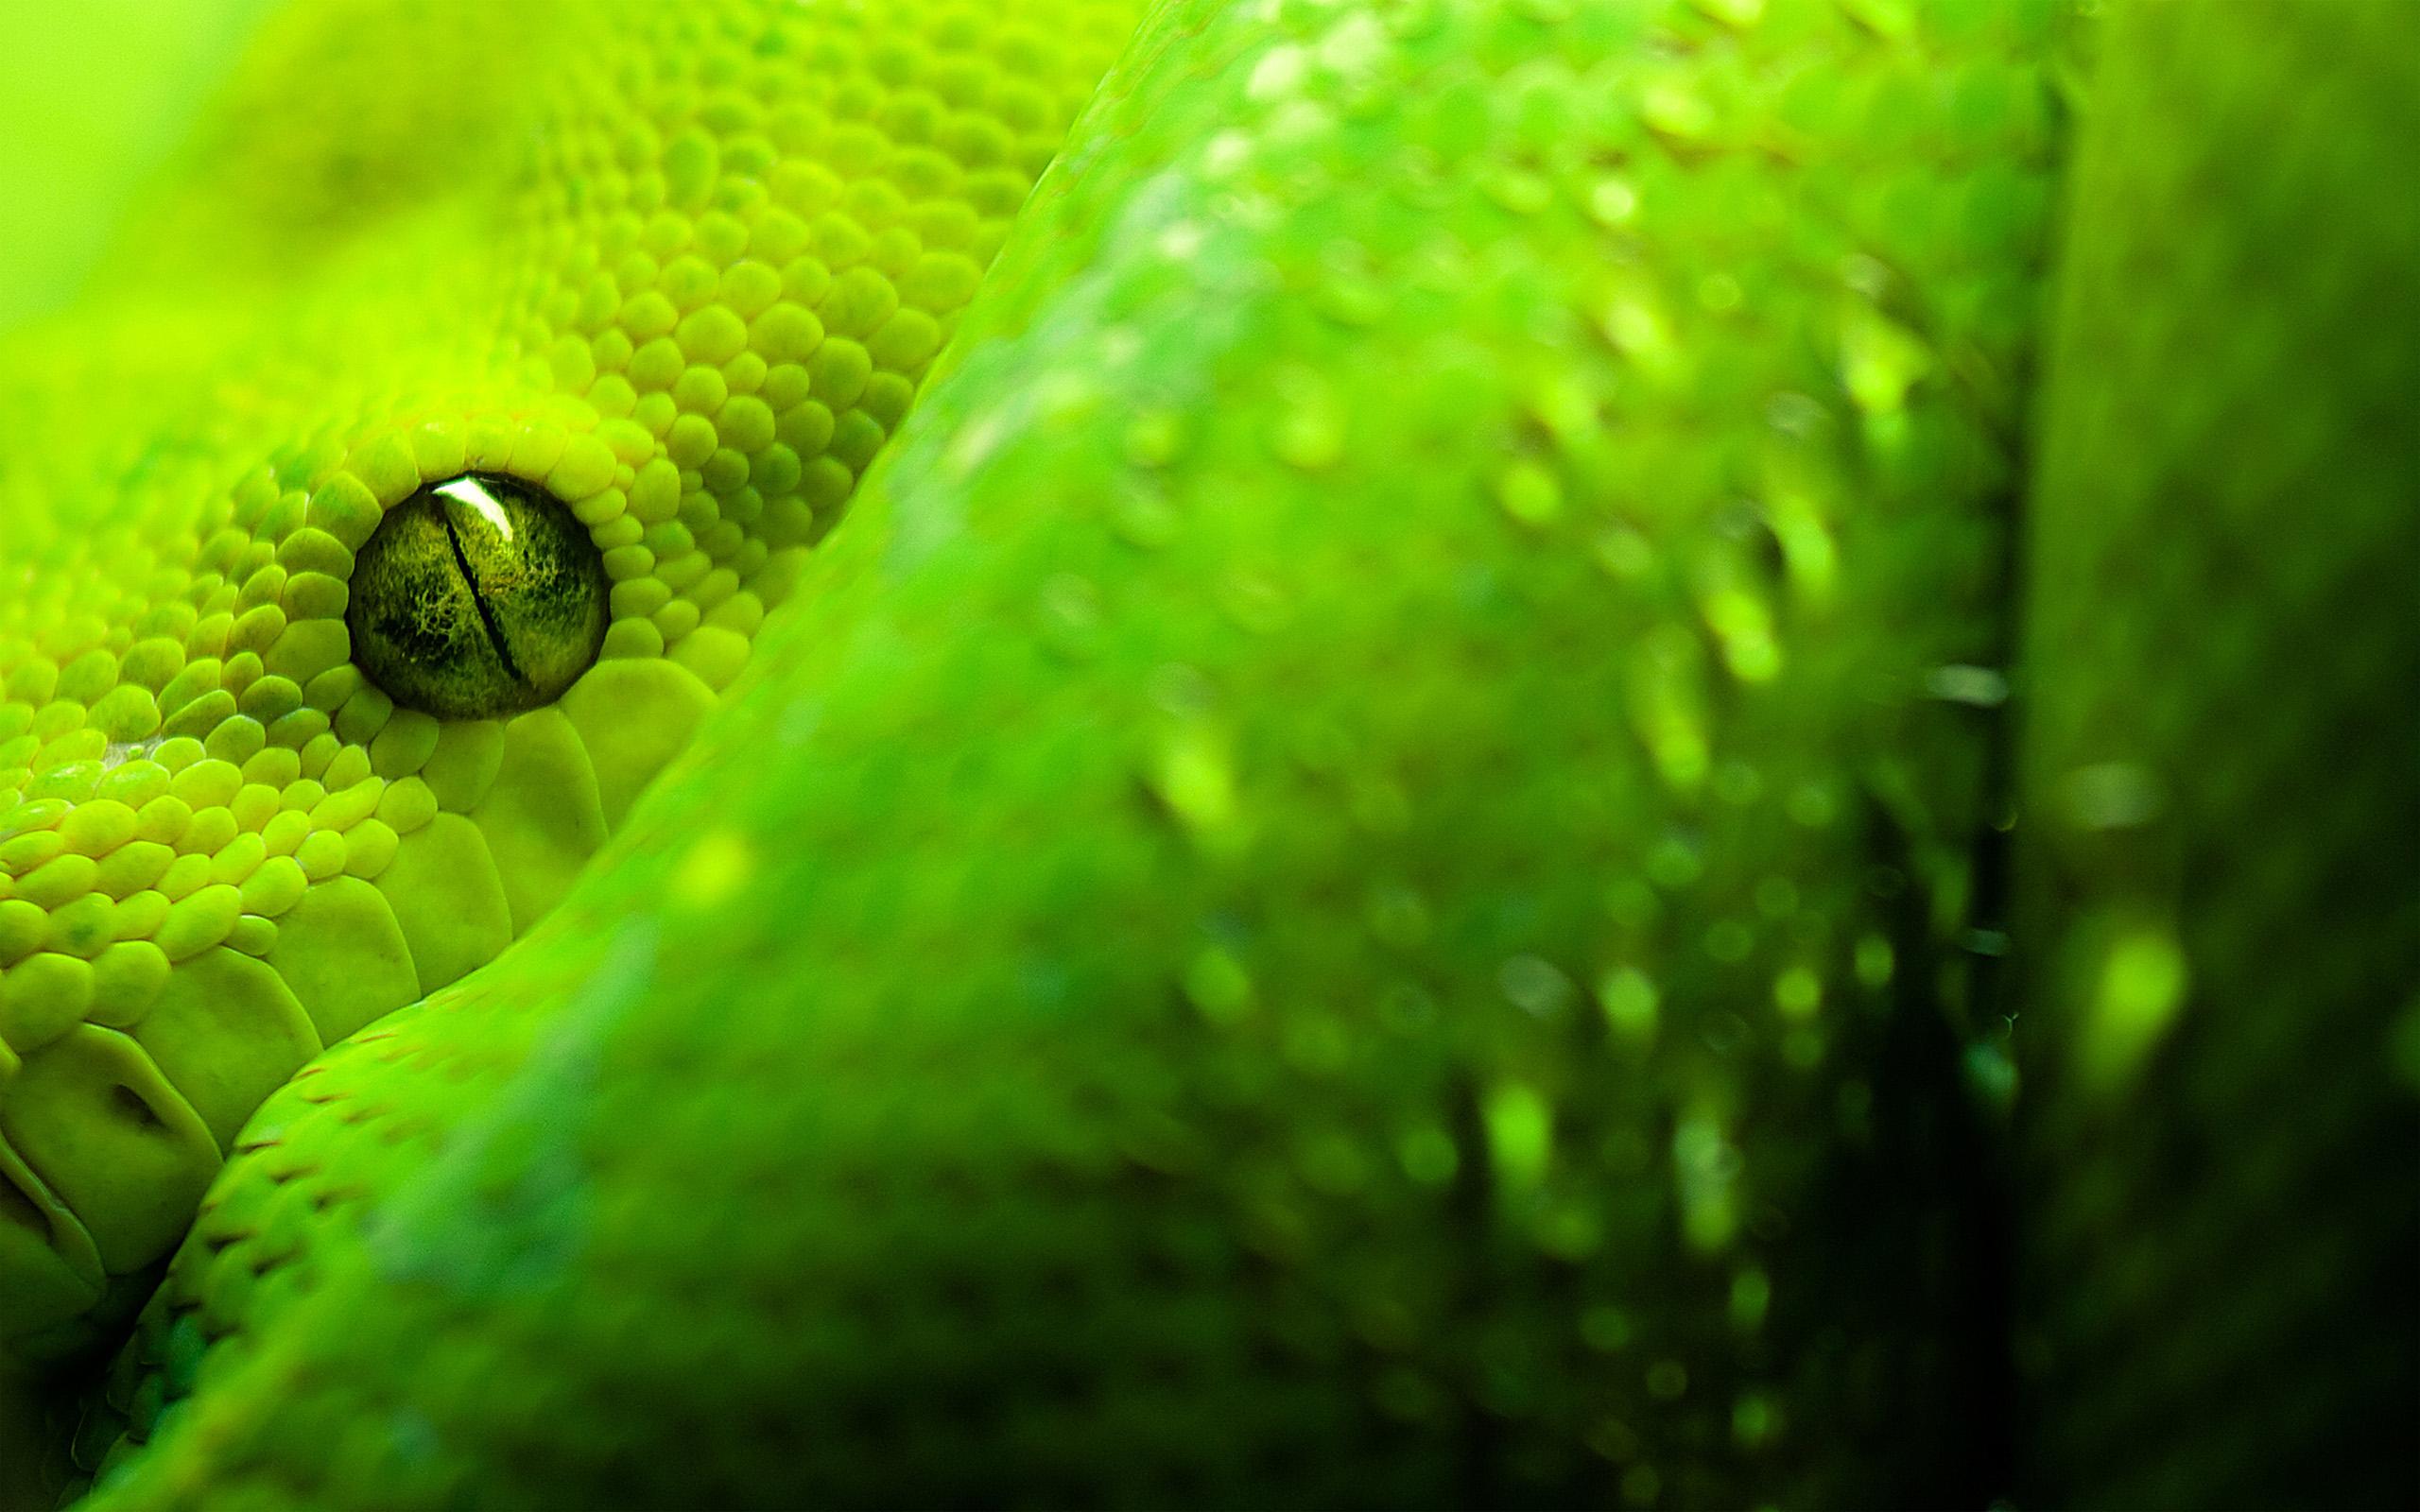 Green Snake Look